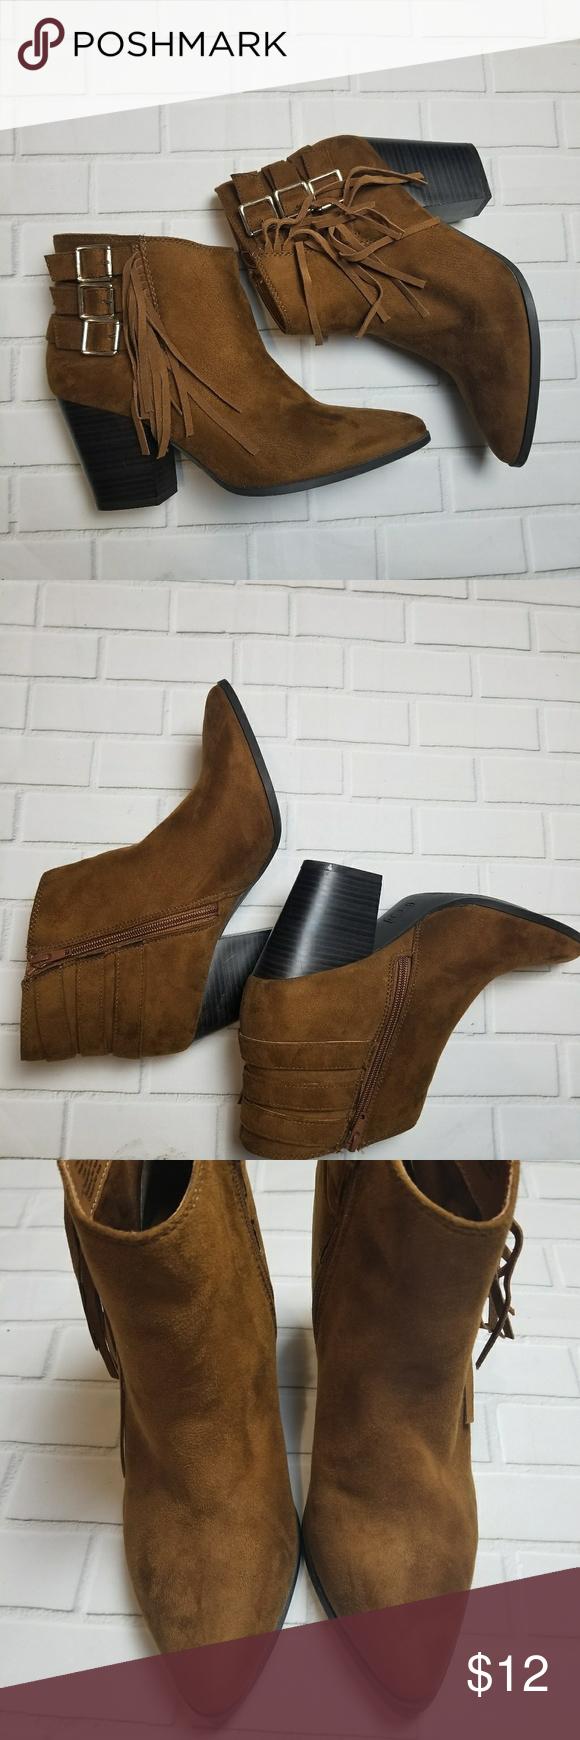 Jennifer Lopez Jlo Cognac Heel Boots 10m Heeled Boots Boots Cognac Heels